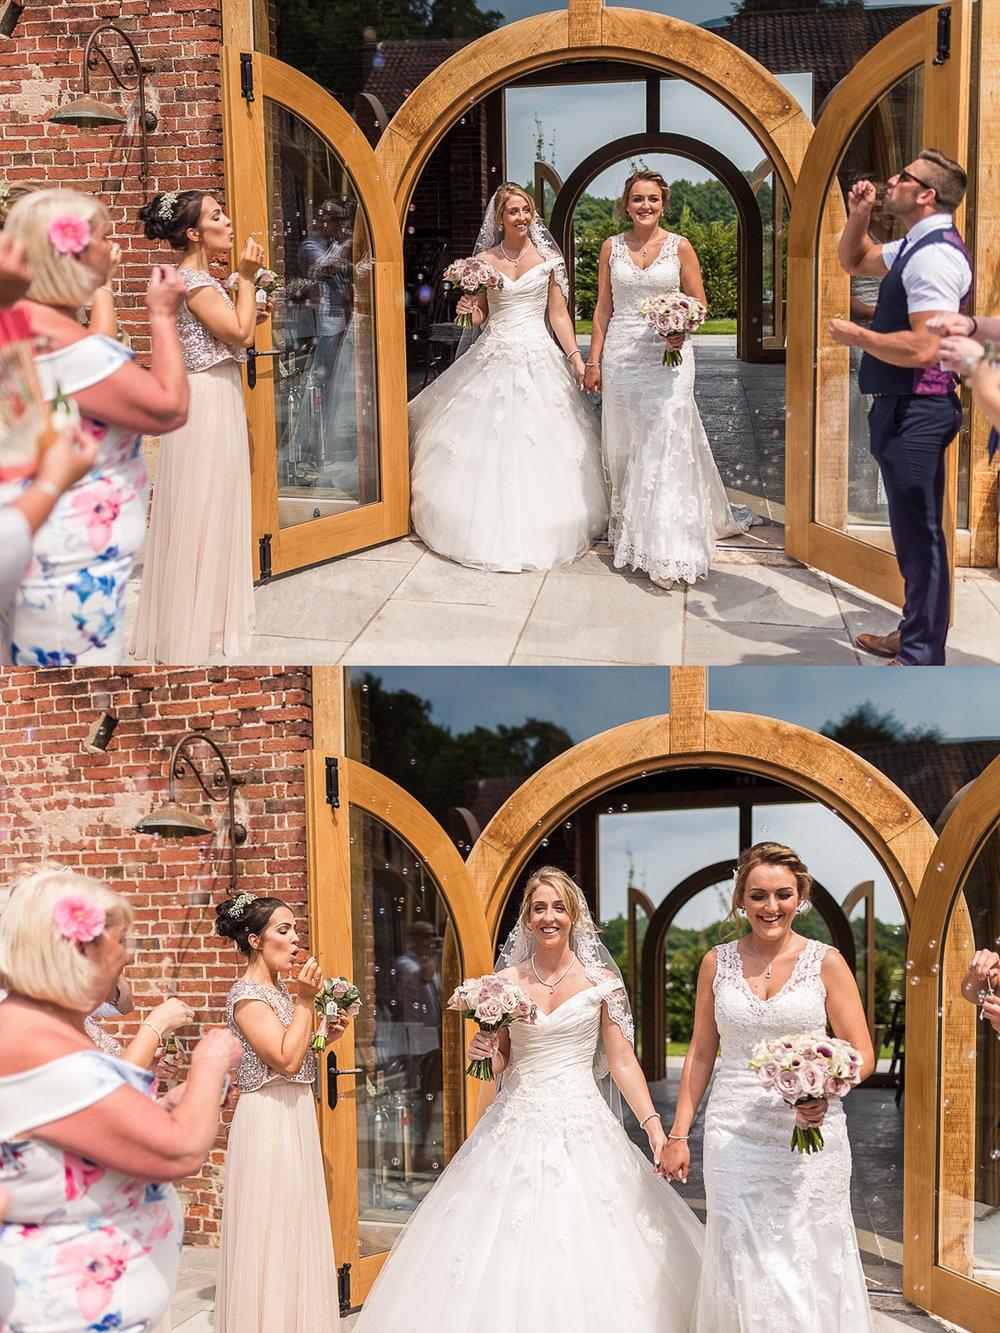 Bride and Bride walking through bubble exit after ceremony